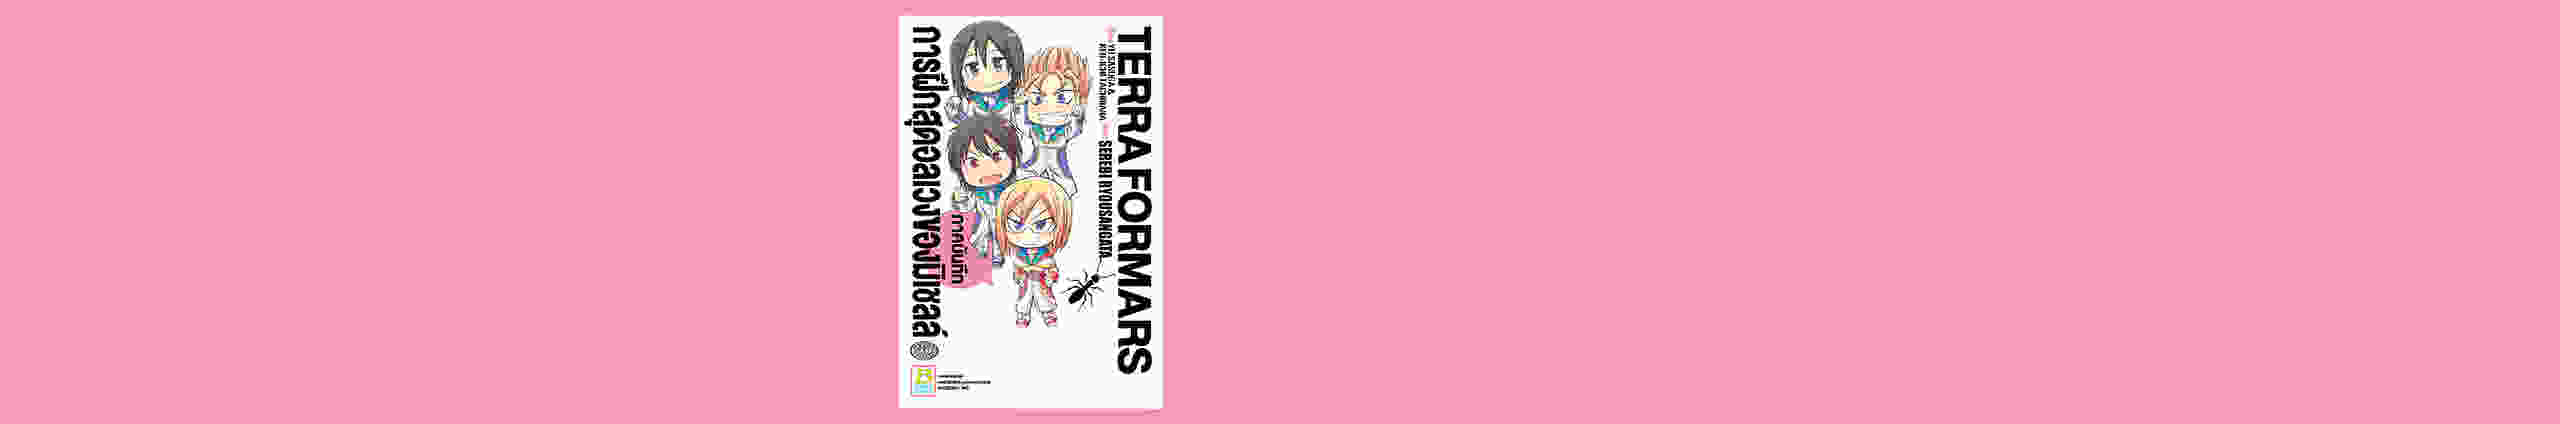 TERRA FORMARS ภาคบันทึกการฝึกสุดอลเวงของมิเชลล์